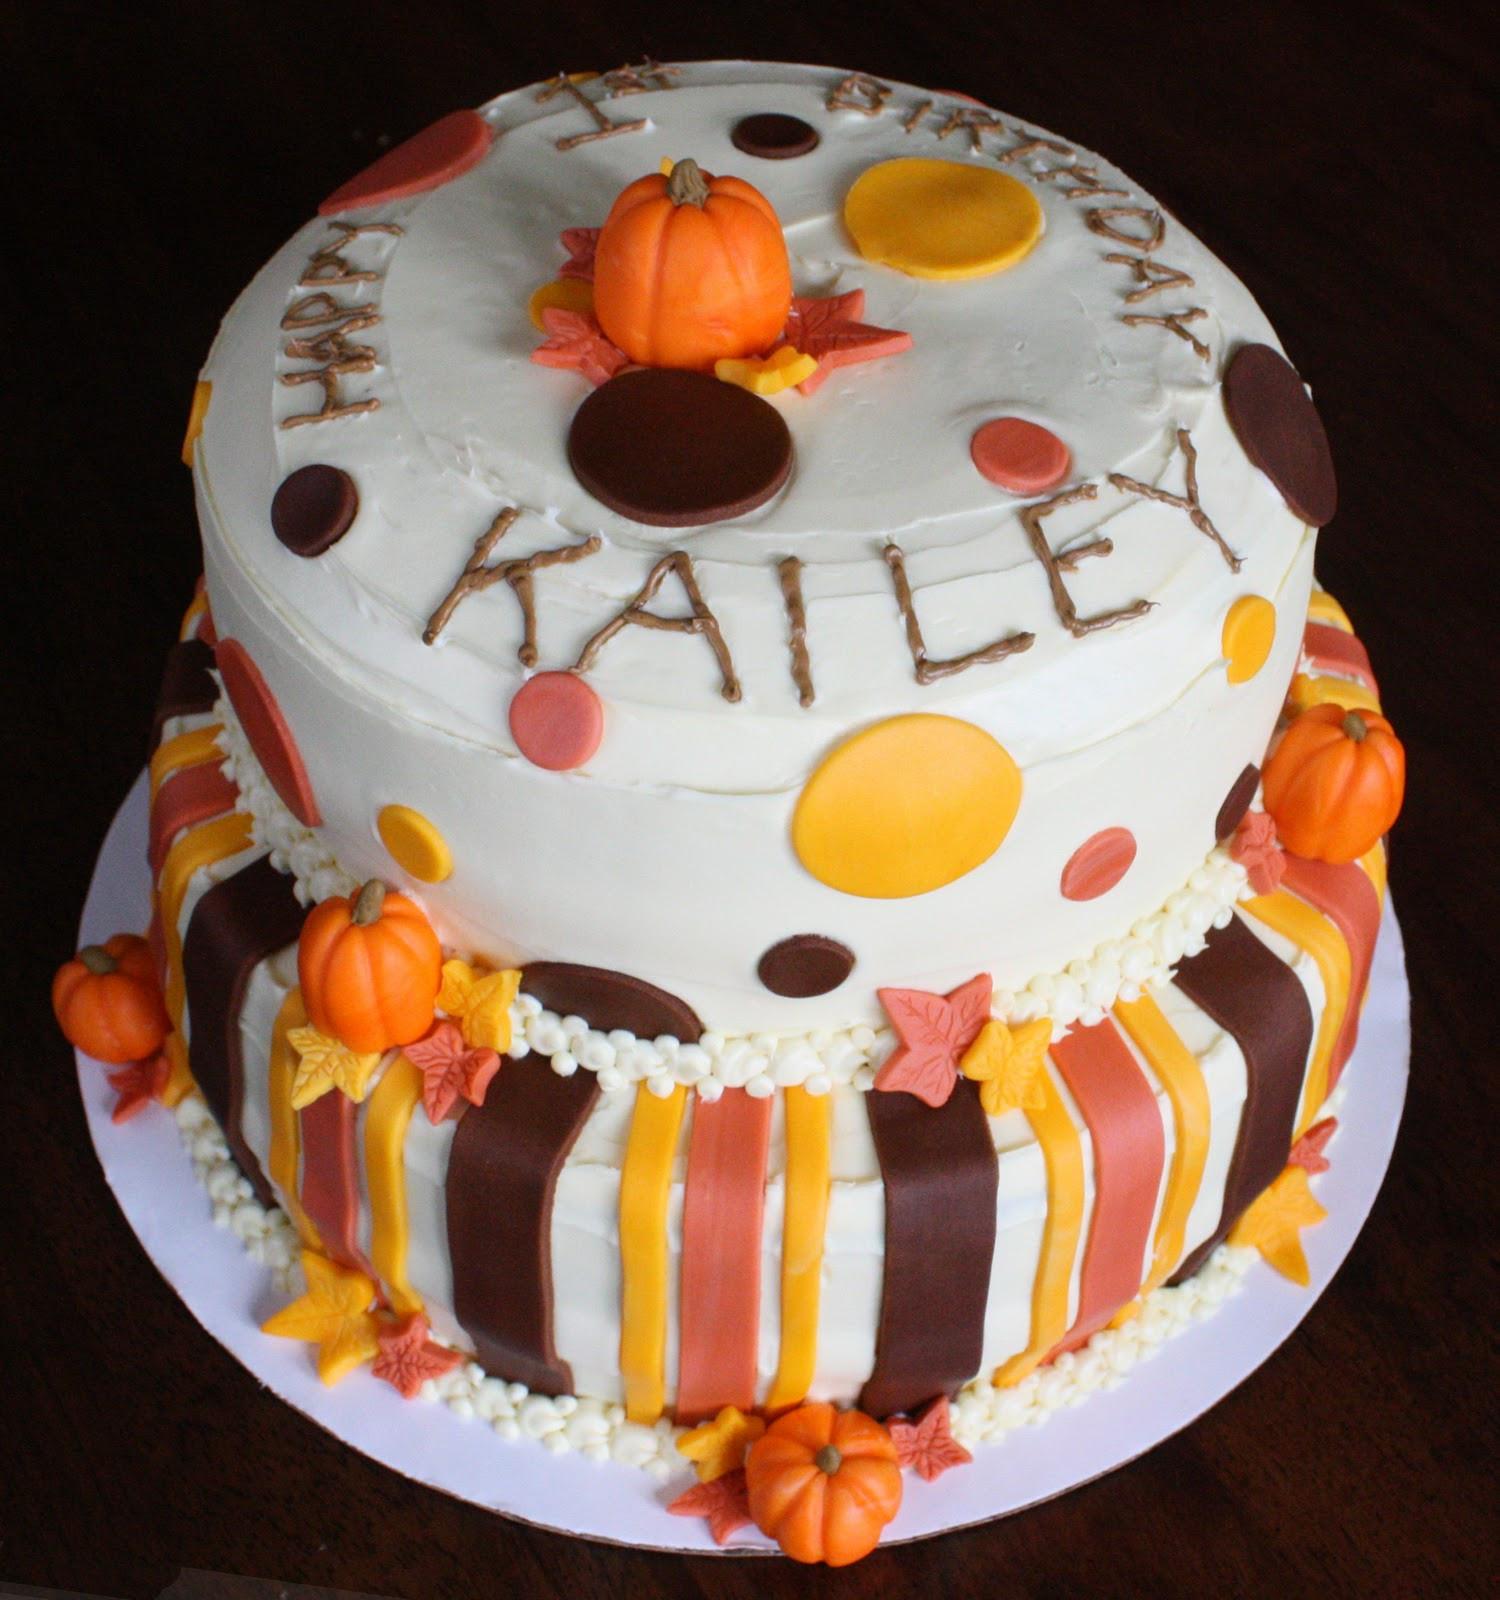 Fall Birthday Cake  Straight to Cake 1st Birthday Fall Theme